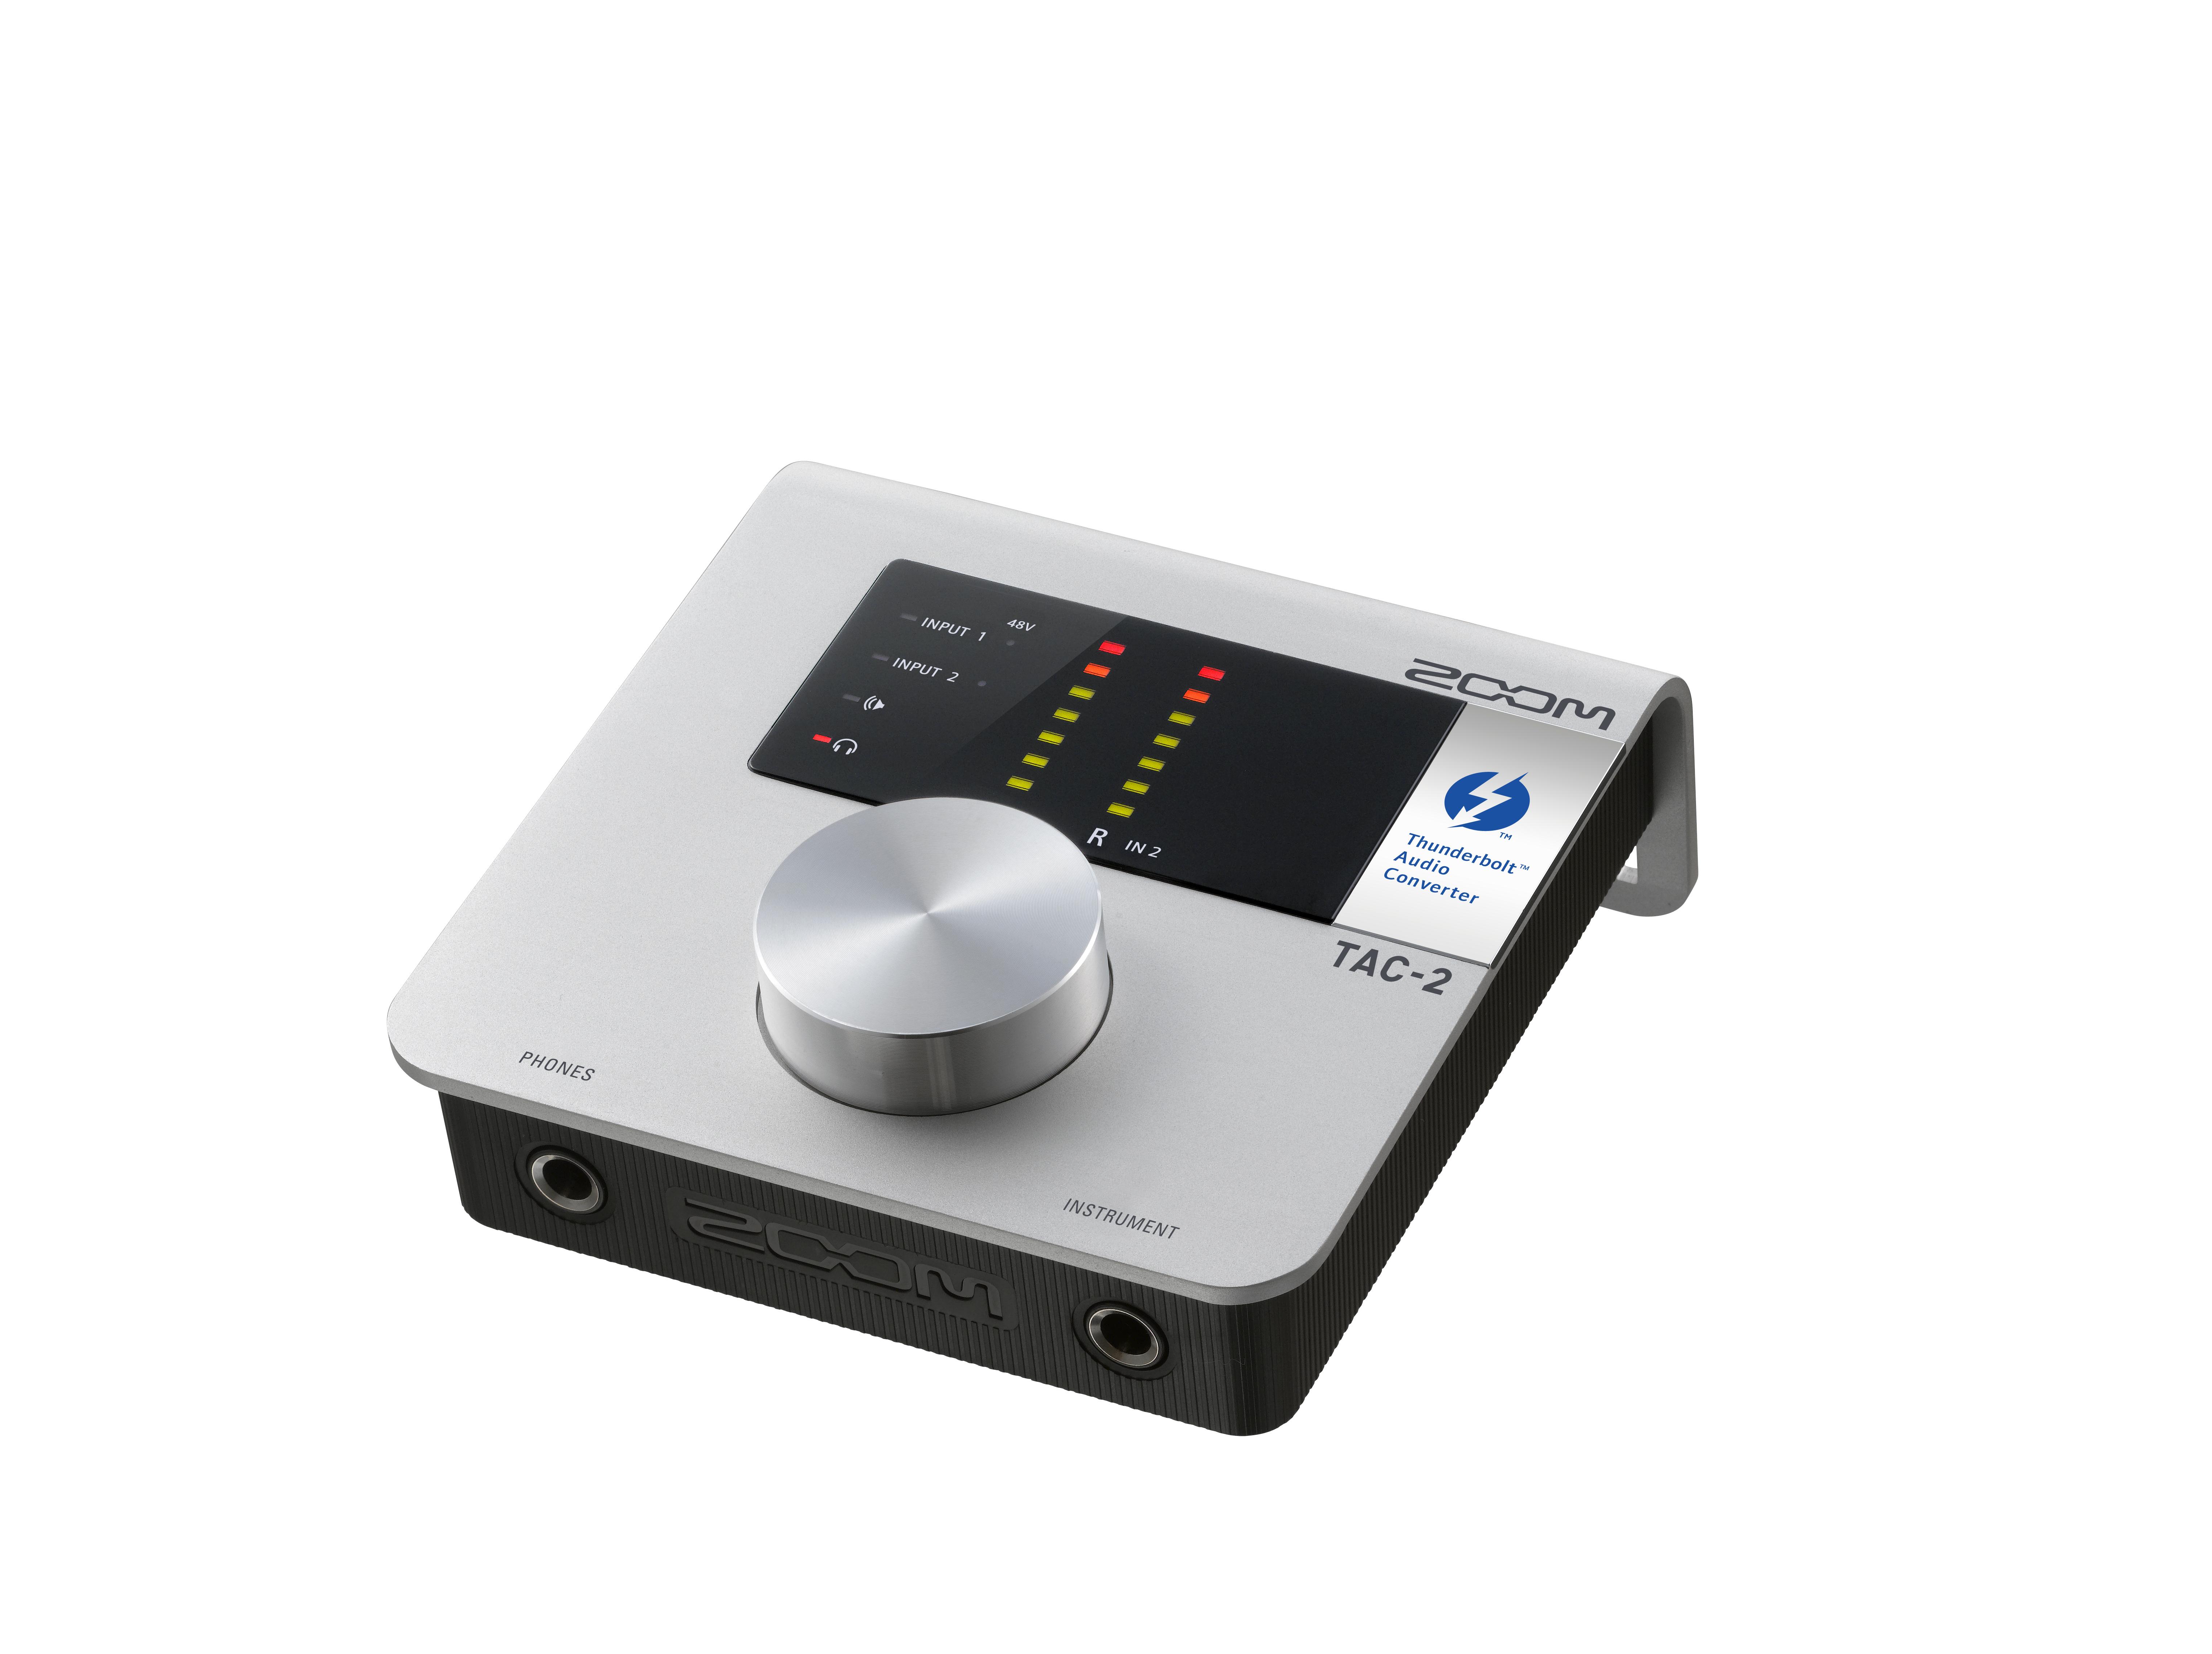 TAC-2 Thunderbolt Audio Converter   Zoom